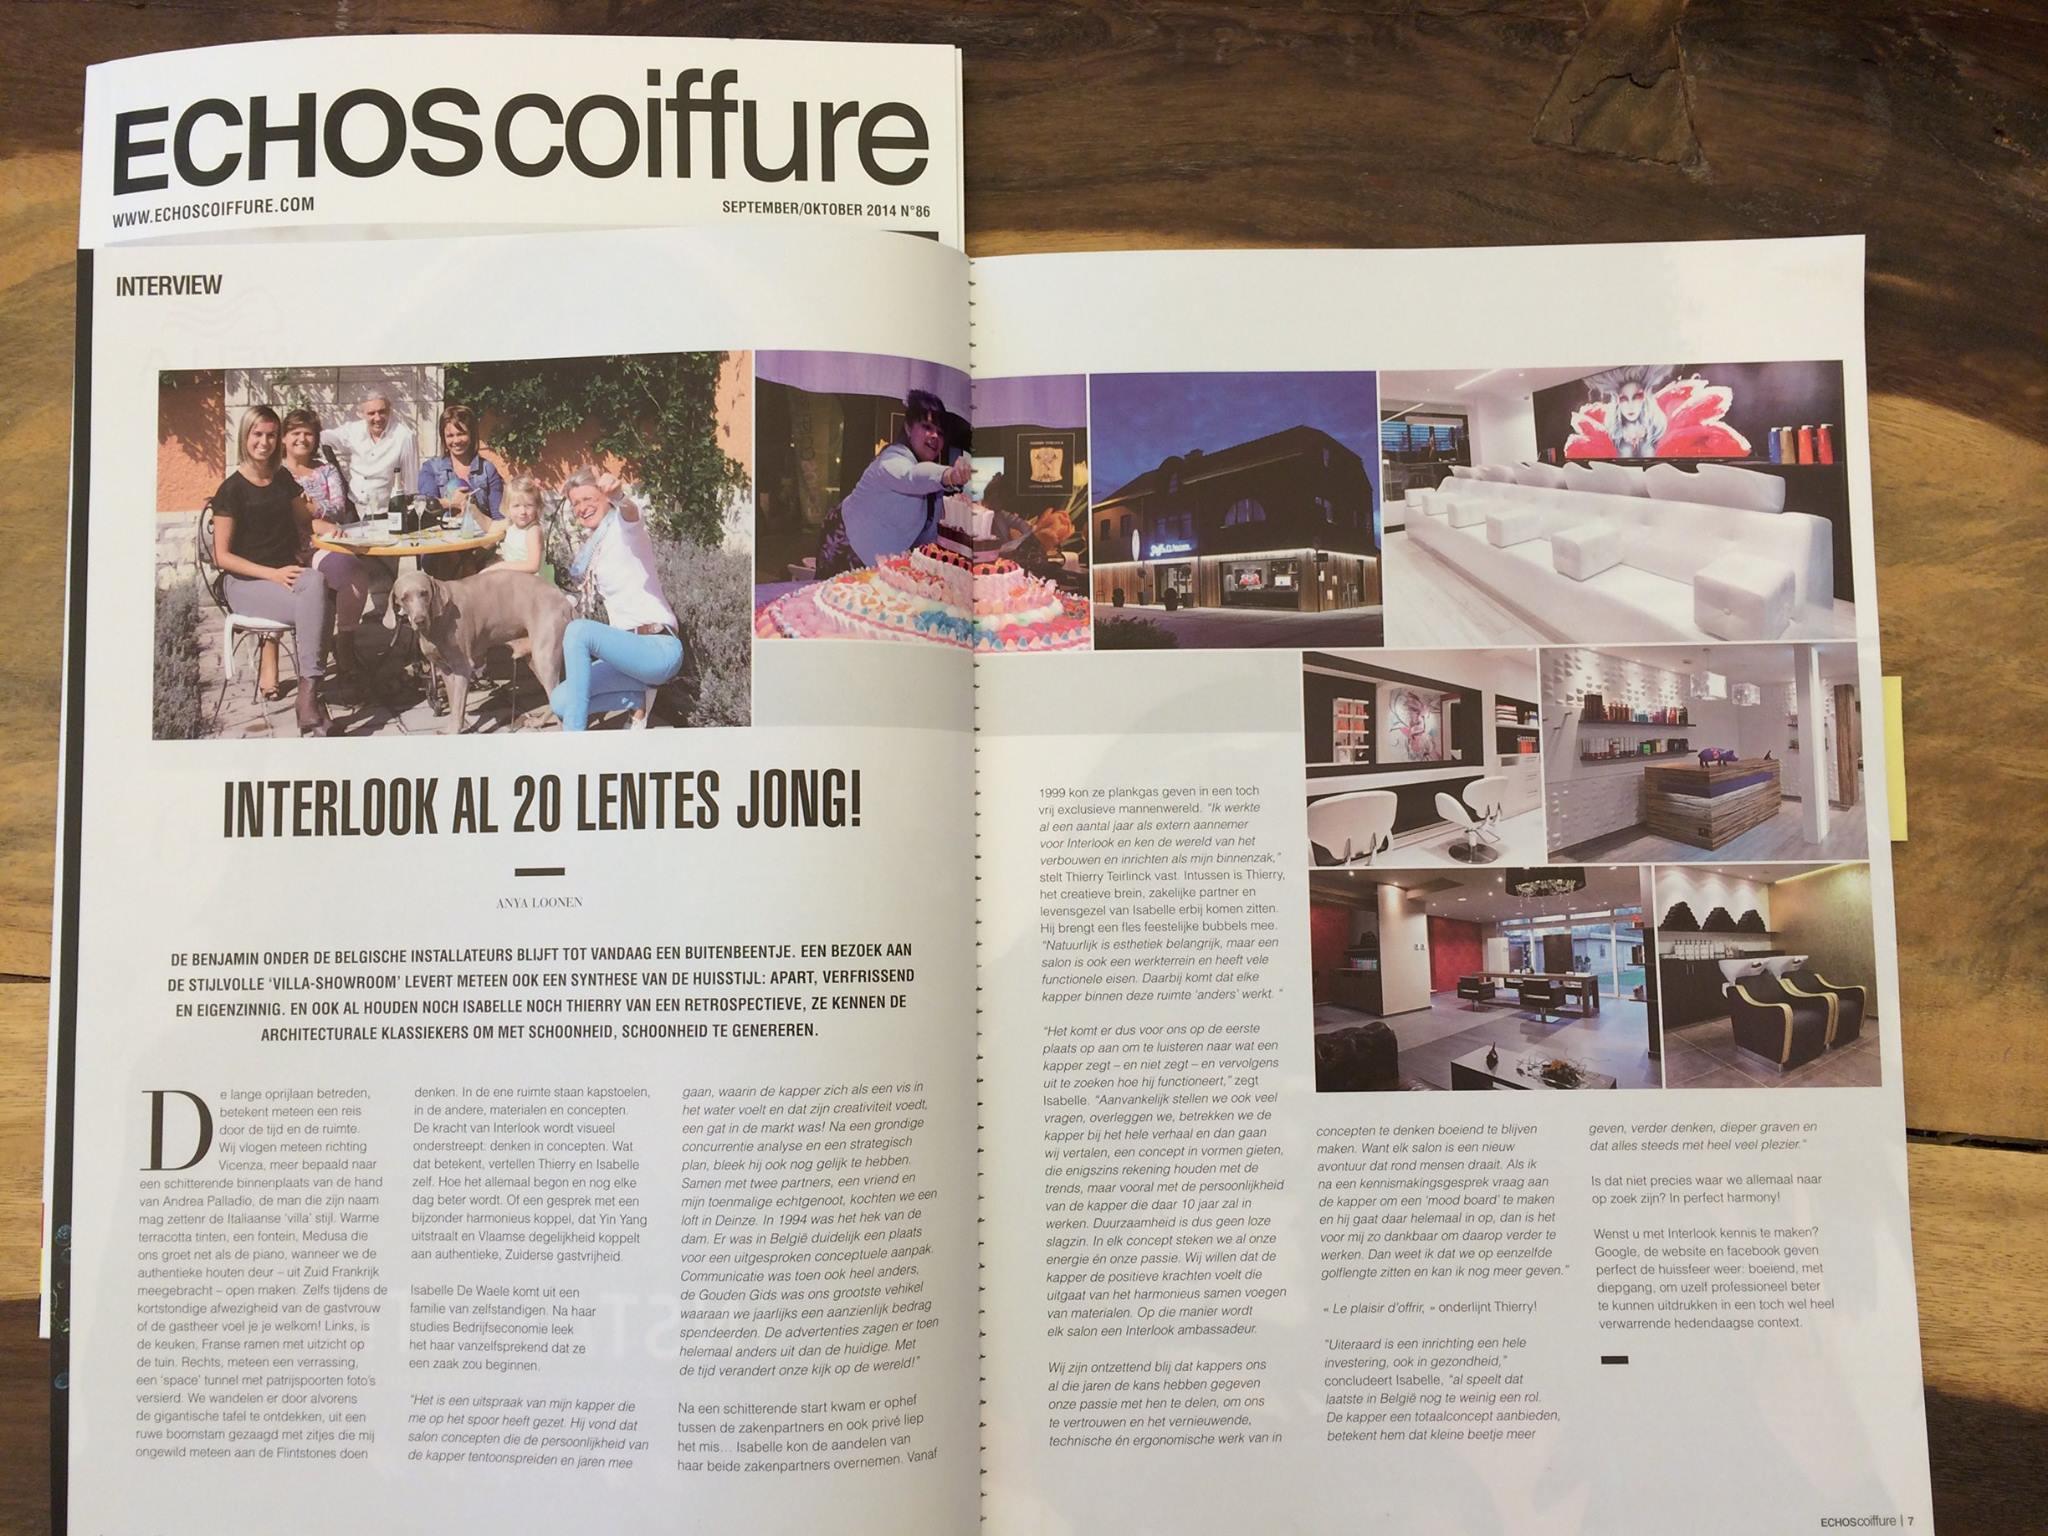 Echos Coiffure Dedicates To Pietranera Belgian Salons